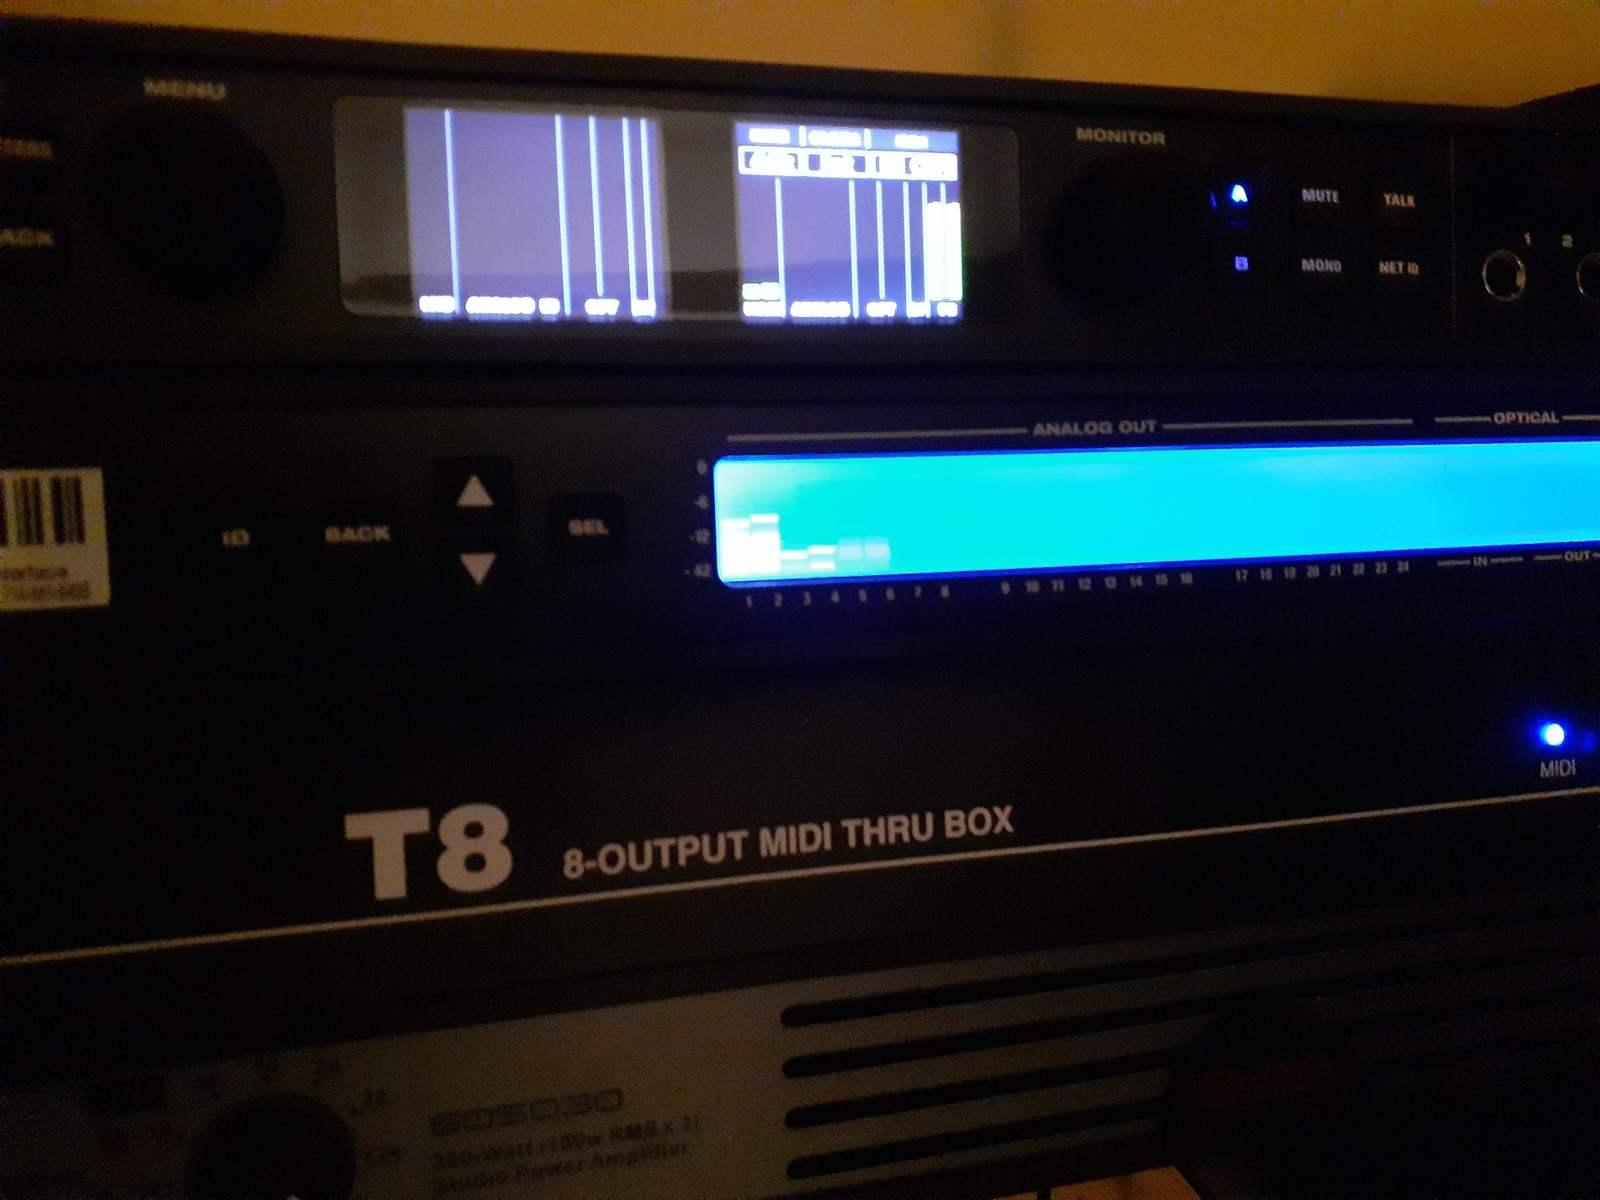 jimmarchi1's music gear photo containing MIDI Solutions T8 8-output MIDI Thru Box, MOTU 24Ao USB/AVB Ethernet Audio Interface, and MOTU 828es